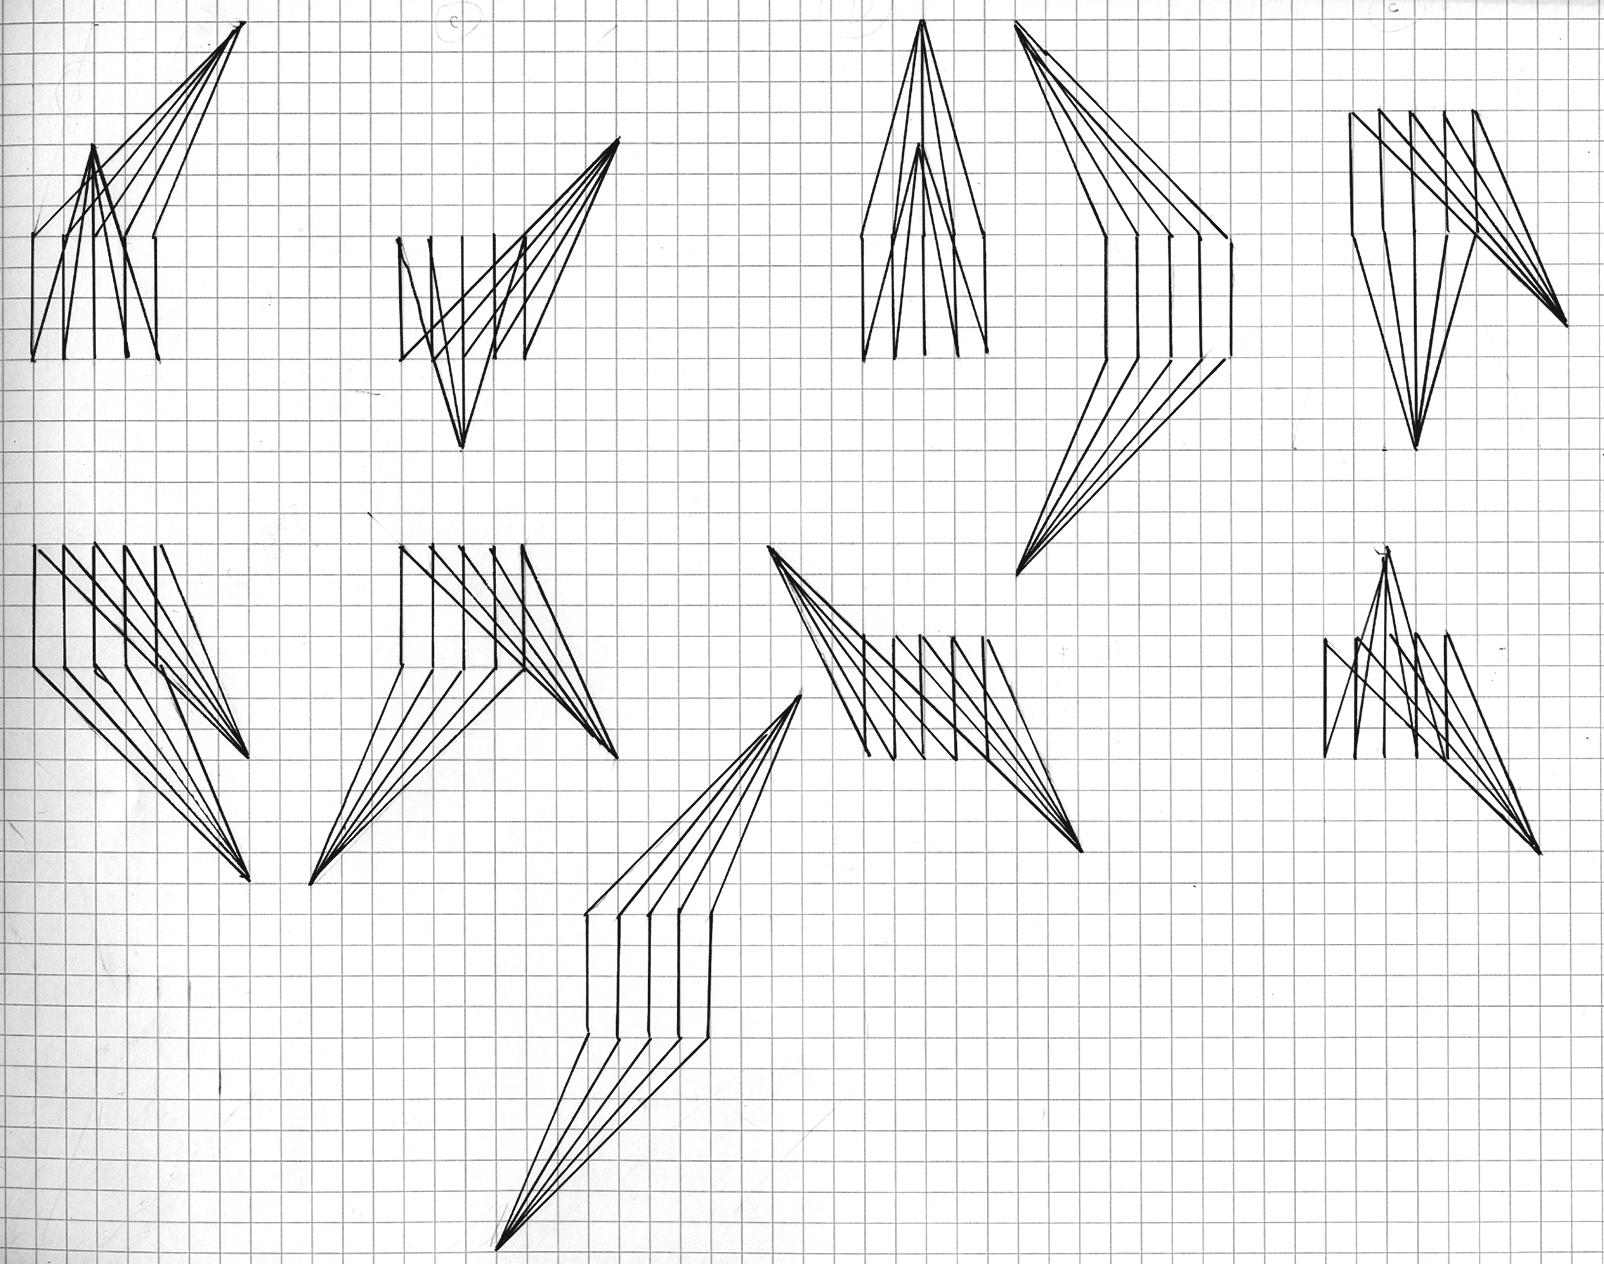 Figuras permutables 2